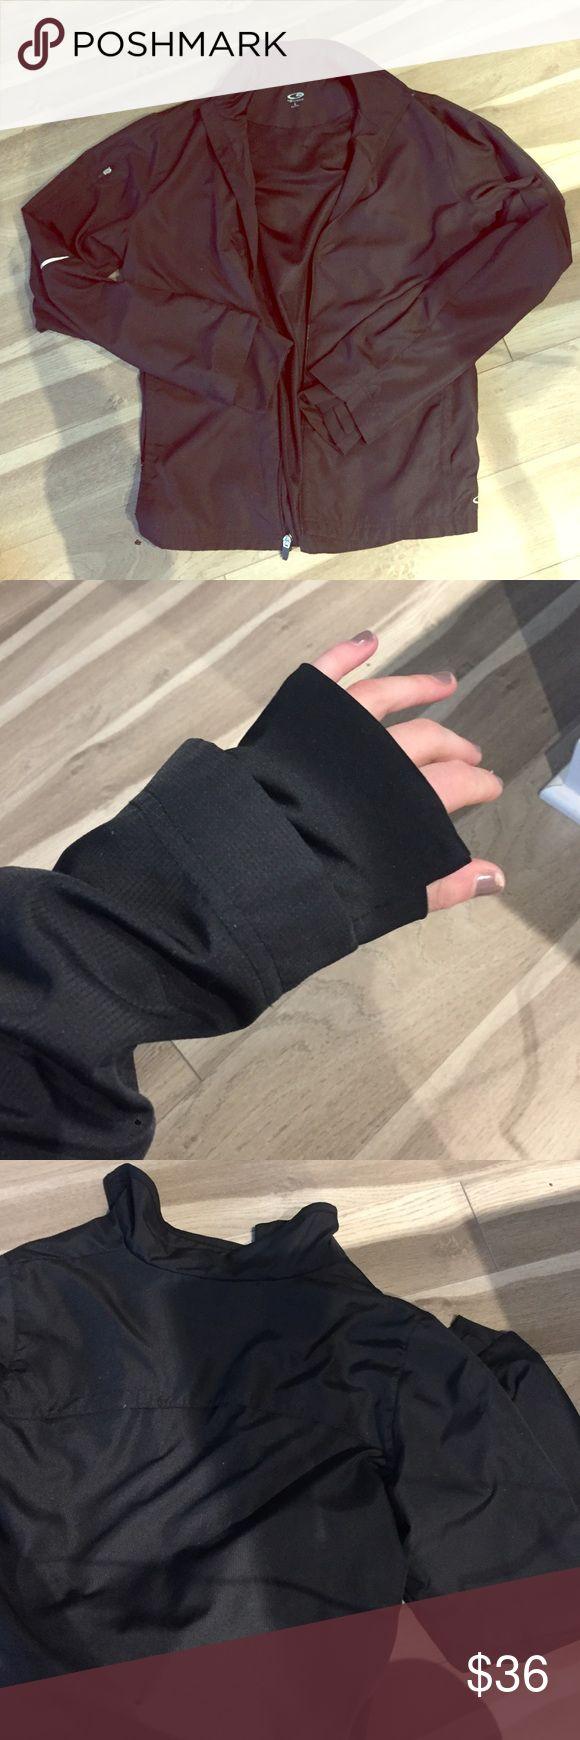 CHAMPION BLACK WIND BREAKER JACKET Easy throw on black windbreaker jacket with thumb holes in sleeves. CHAMPION Brand from target. Listed as lululemon for branding purposes! lululemon athletica Jackets & Coats